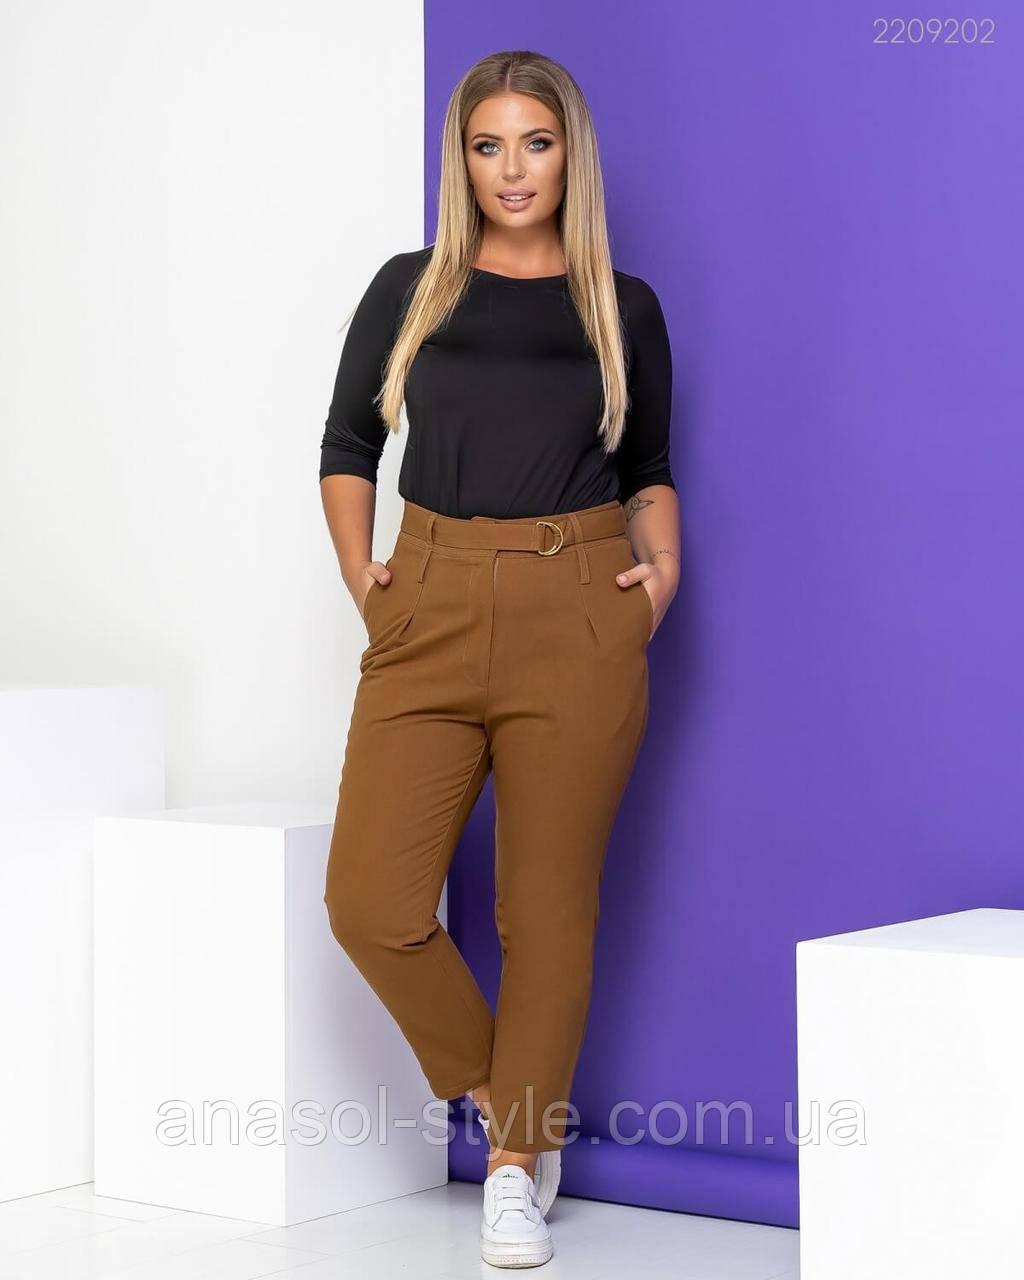 Женские брюки Брюки №2 (капучино) 2209202